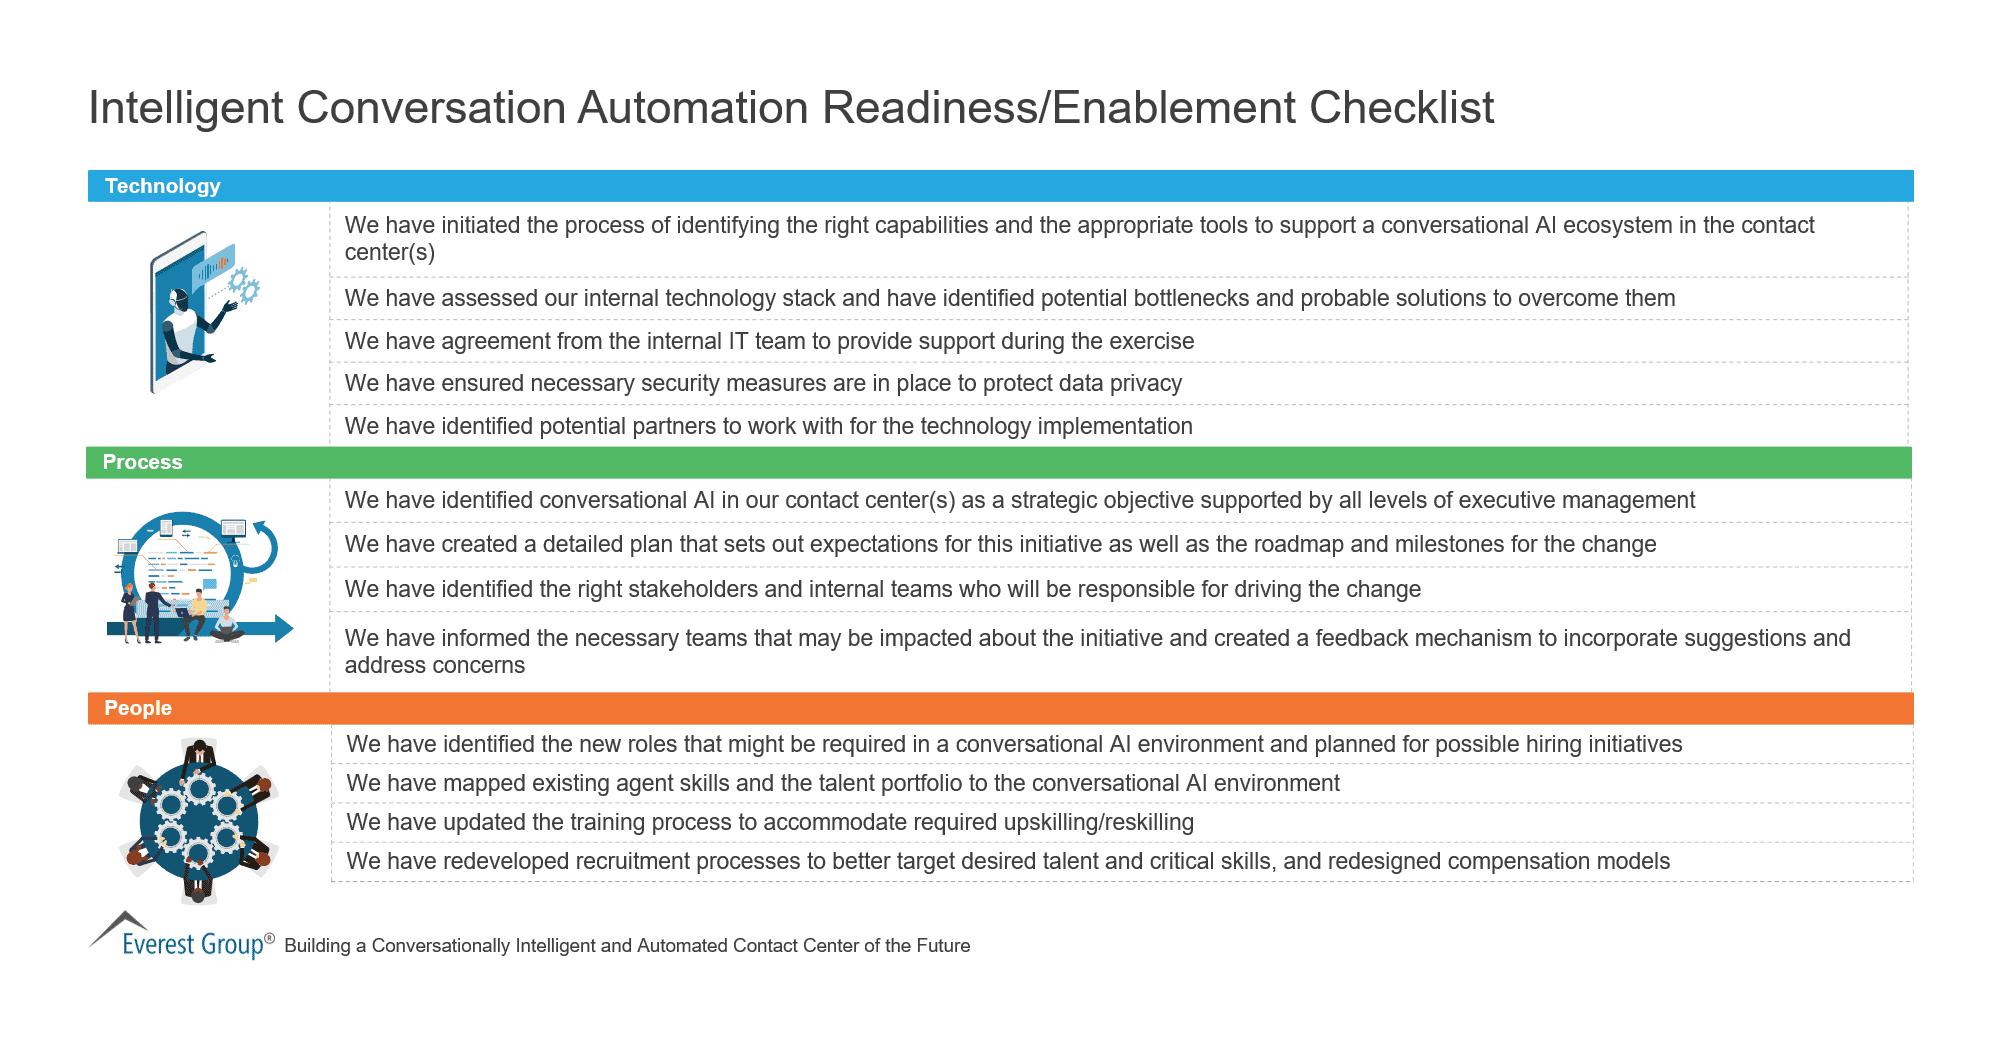 Intelligent Conversation Automation Readiness-Enablement Checklist